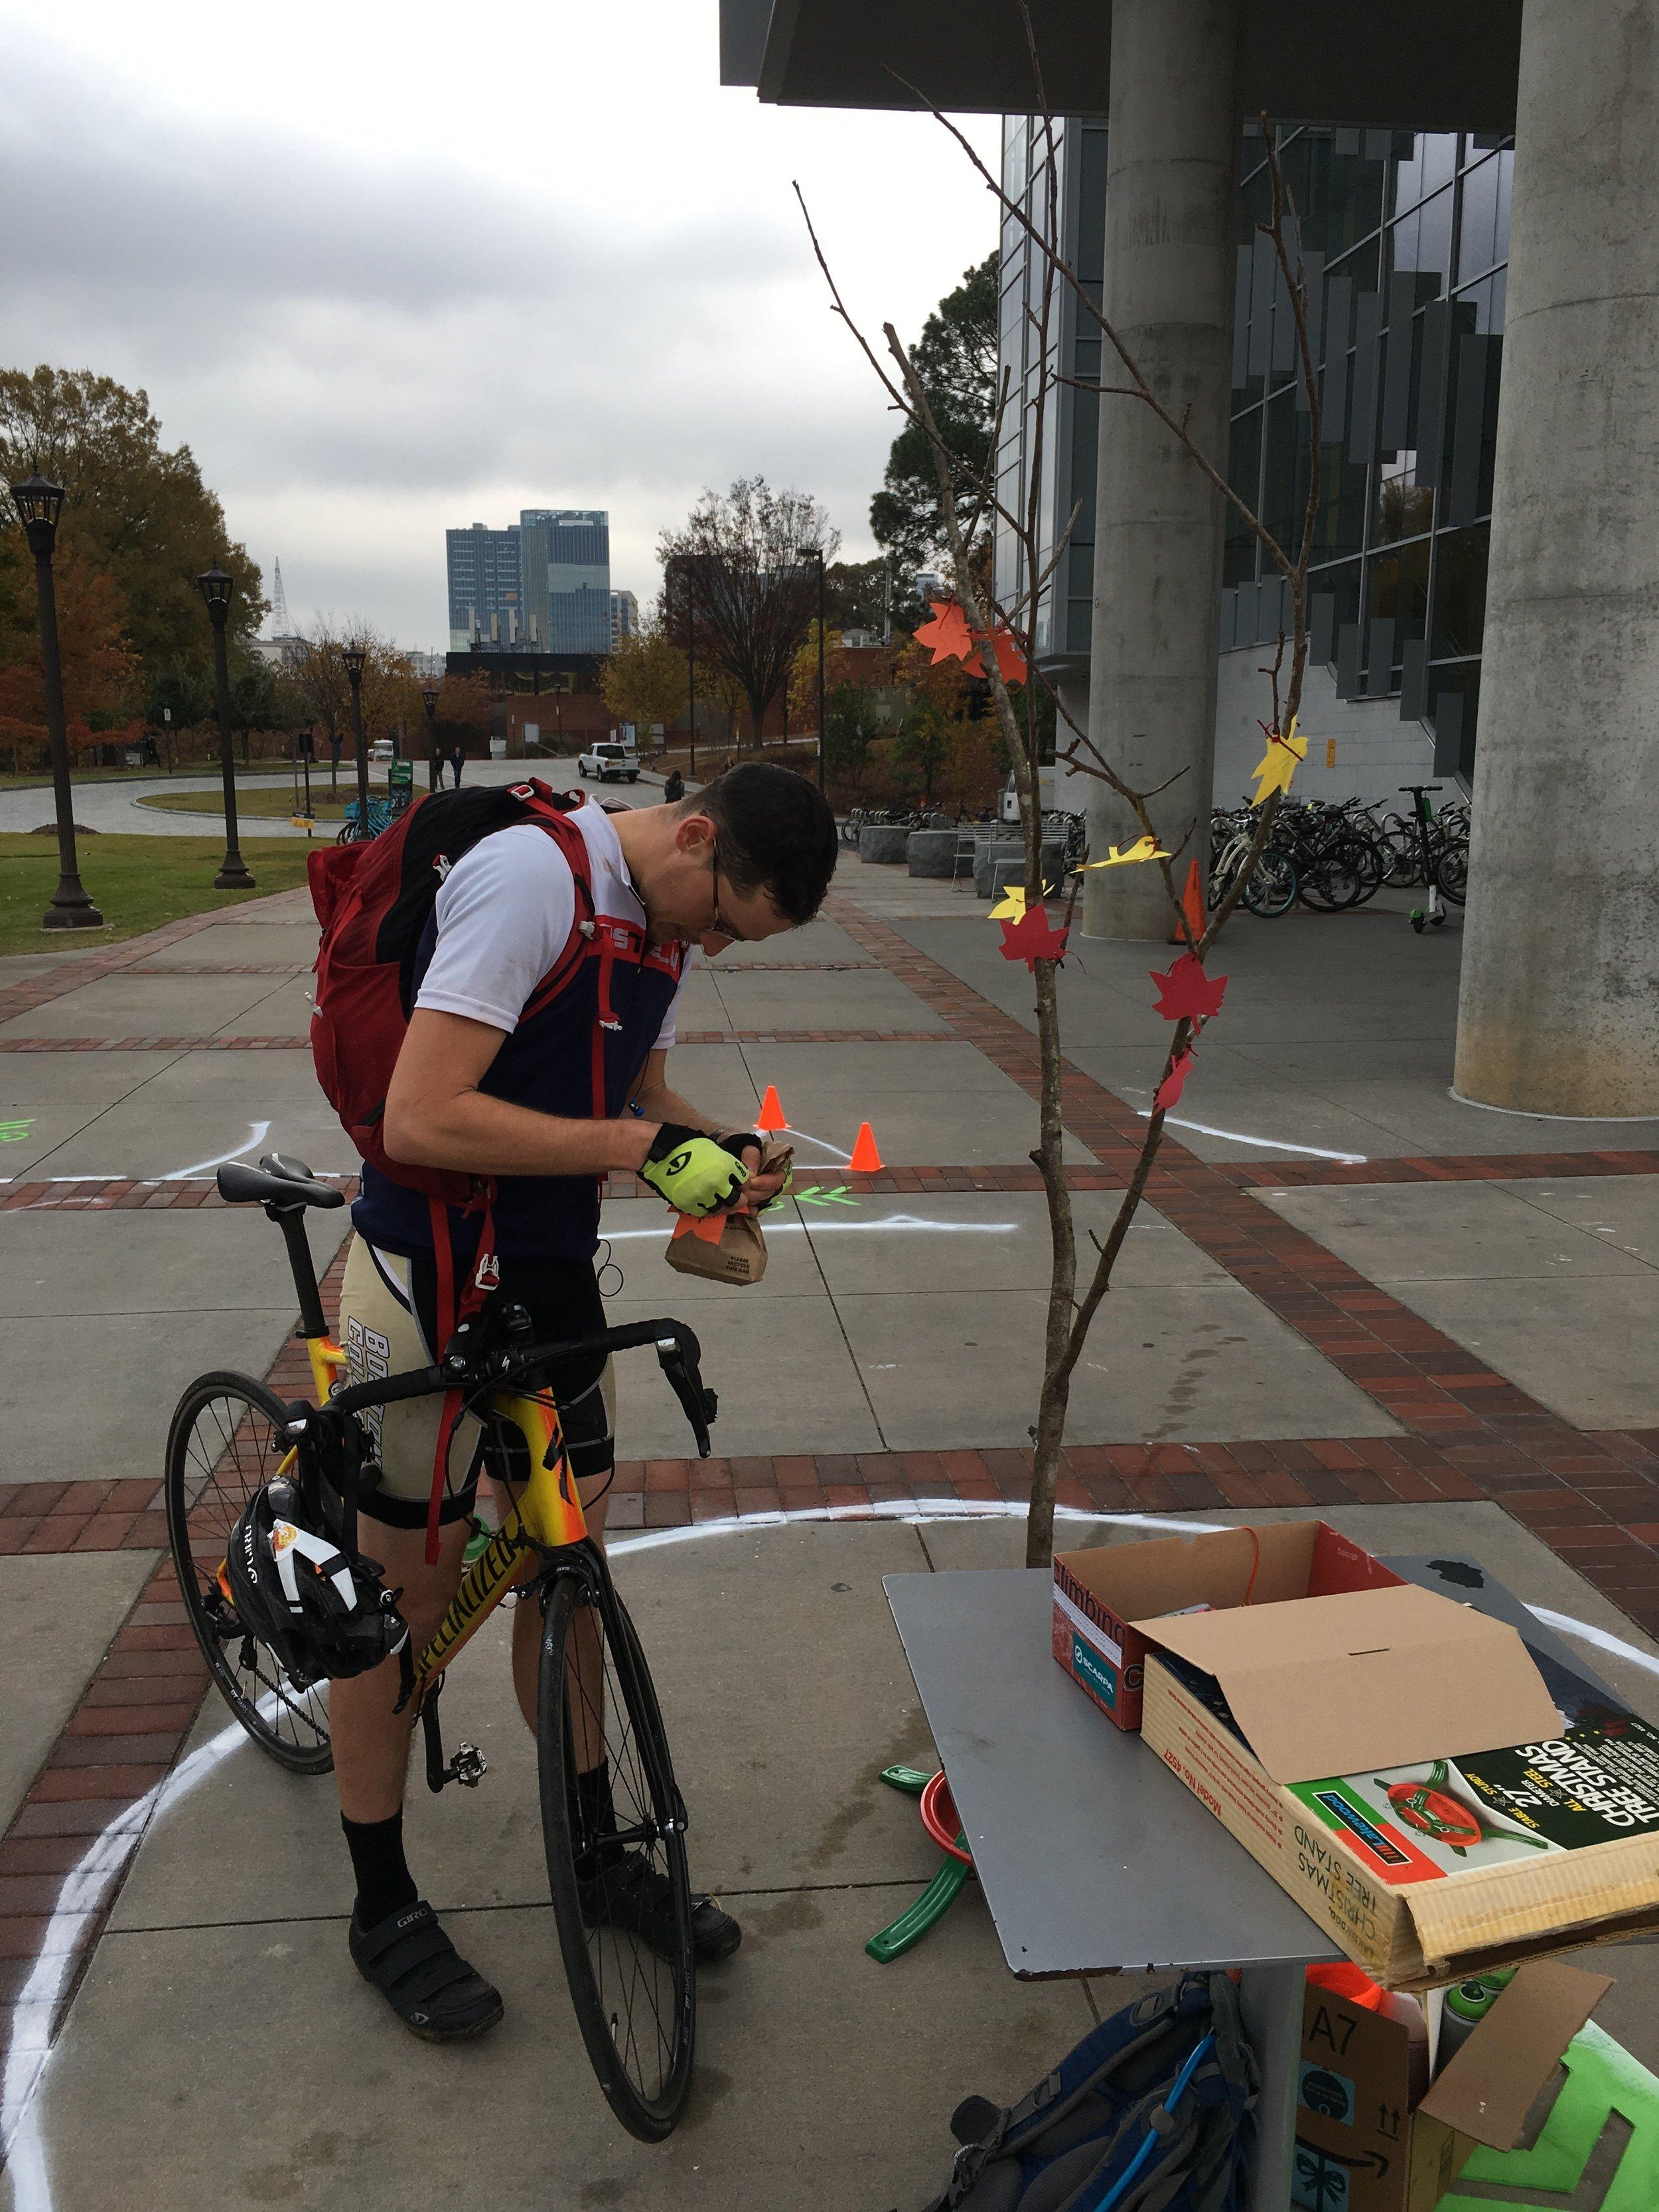 A biker who stopped to take photos of the setup and write a leaf.